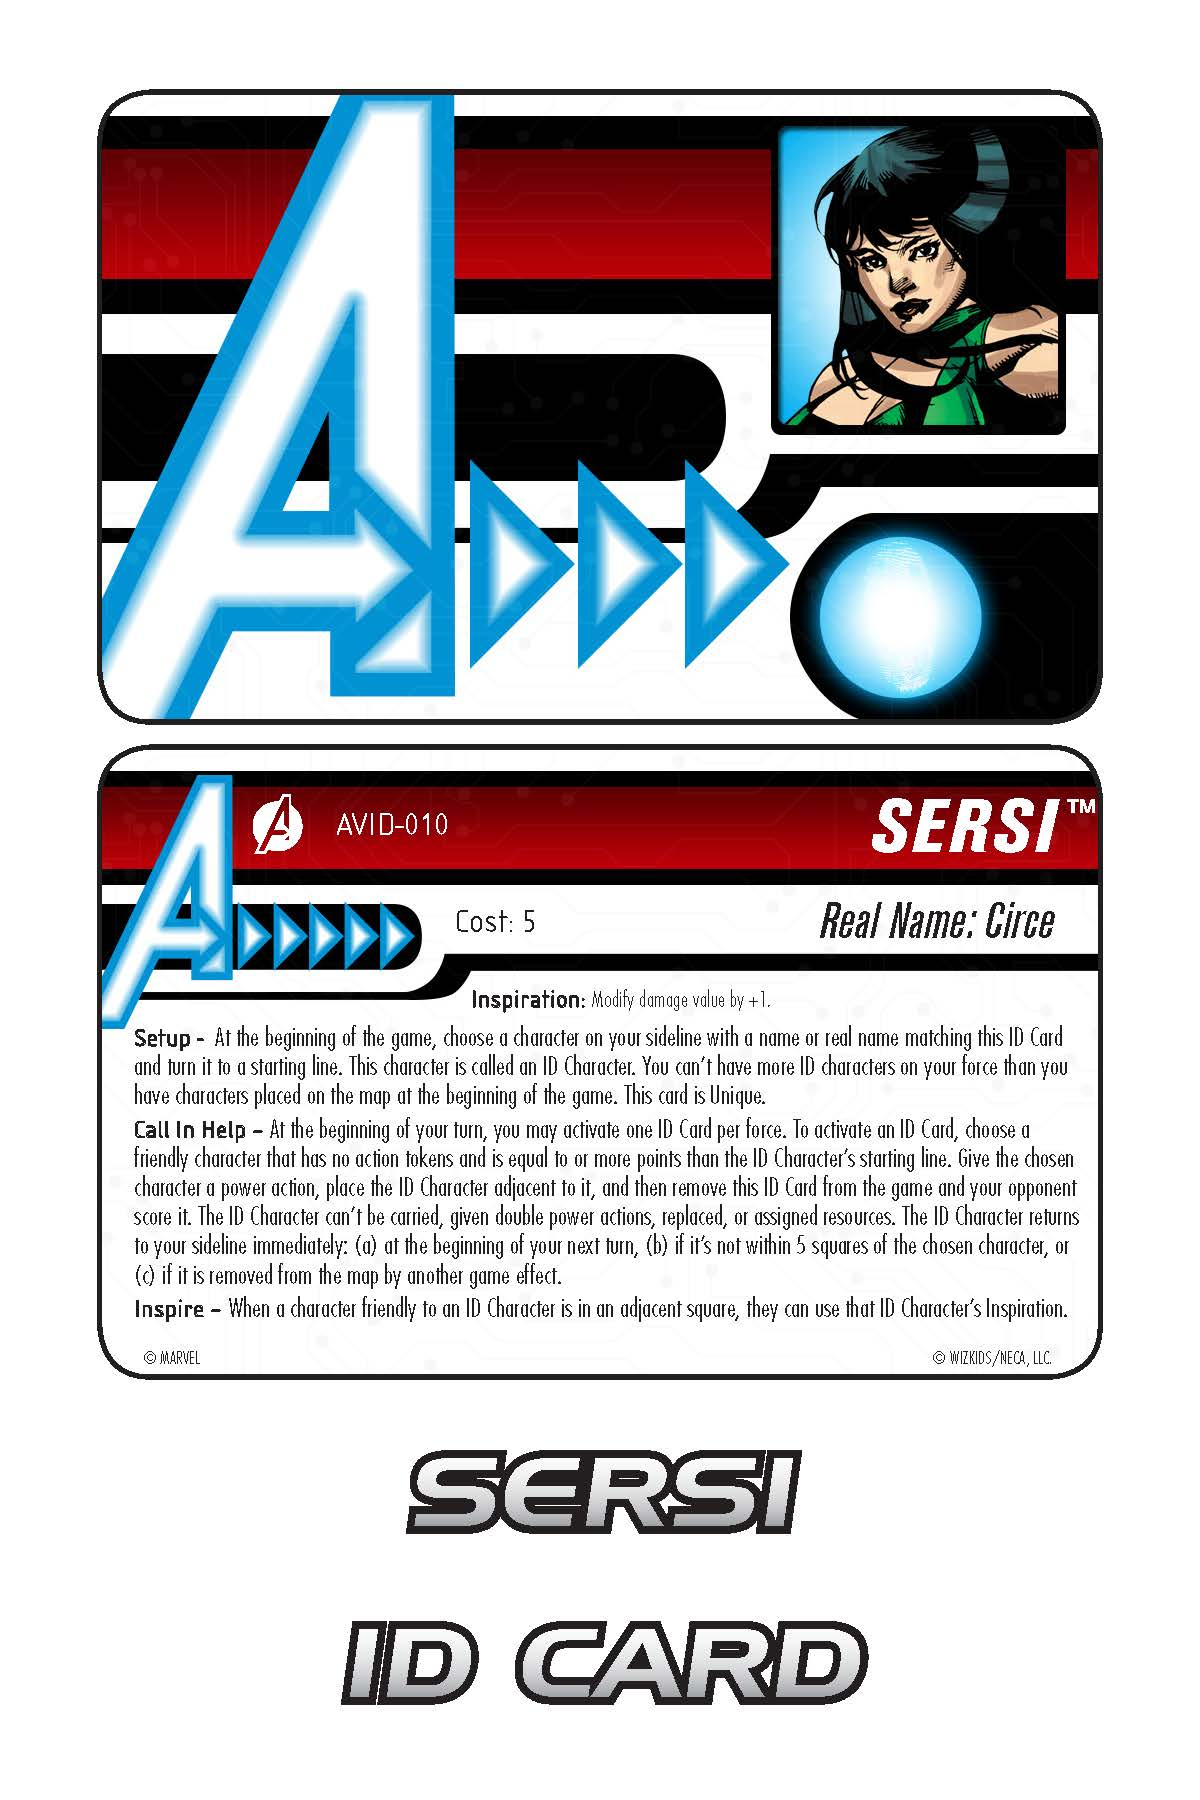 Marvel HeroClix: Avengers ID Card- Sersi